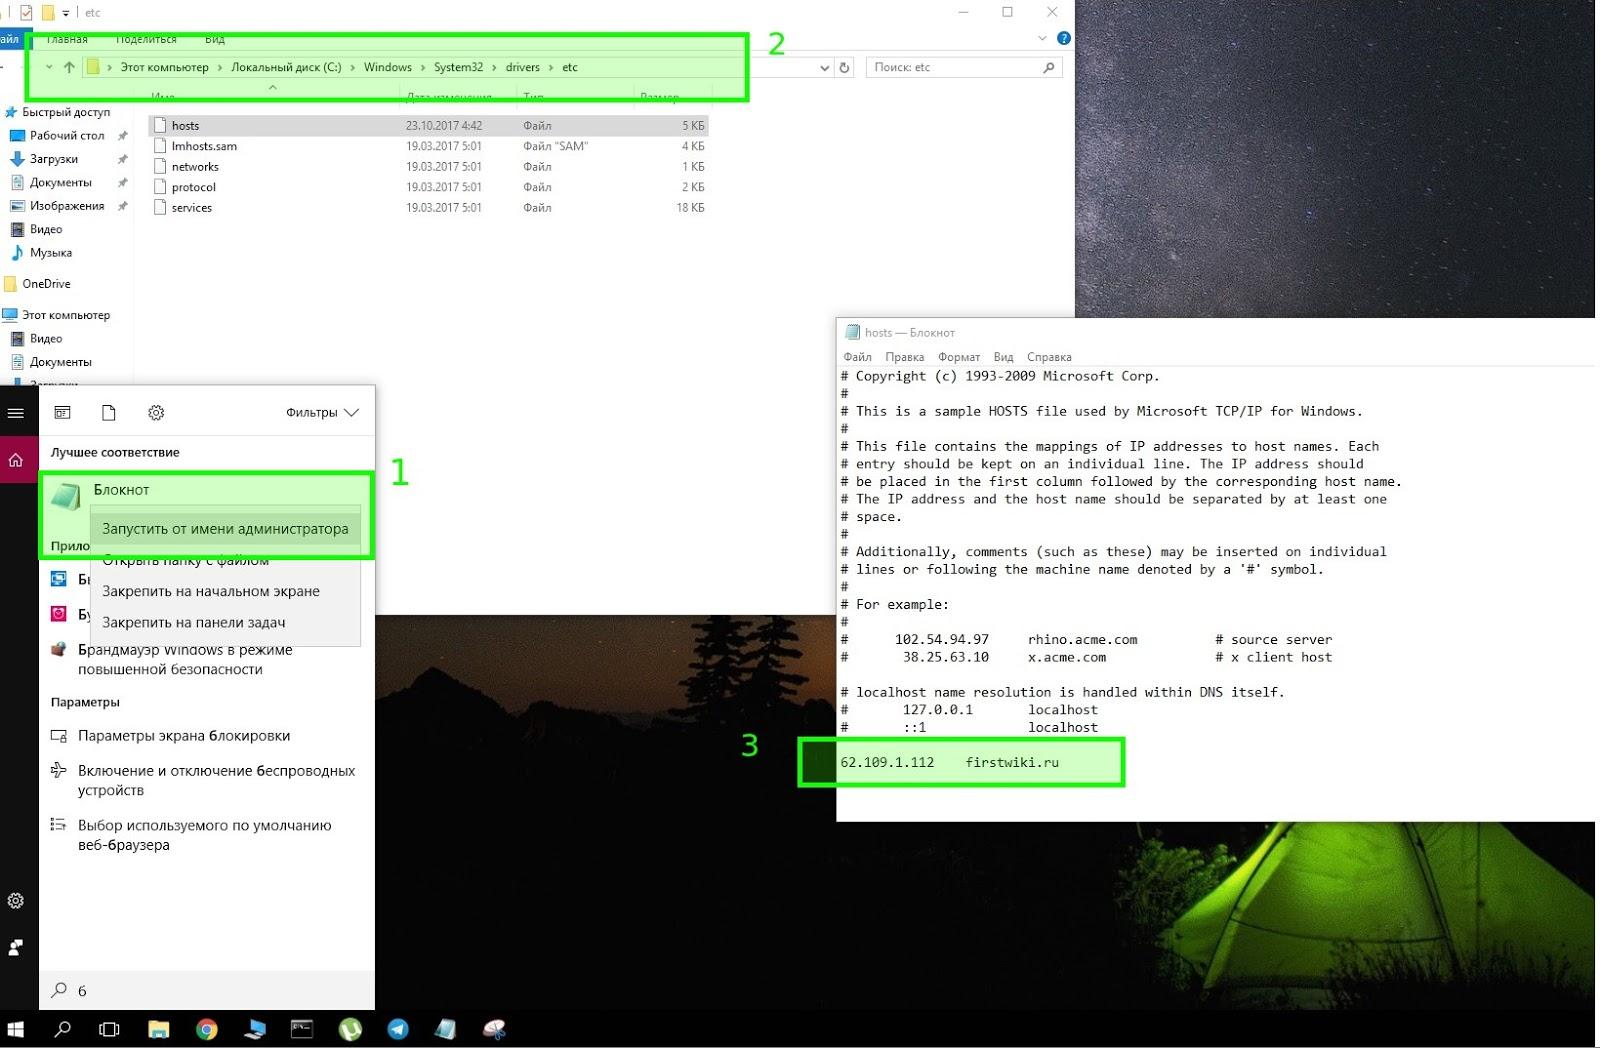 Проверка файла хостинг на компьютере сайт хостинг русоникс